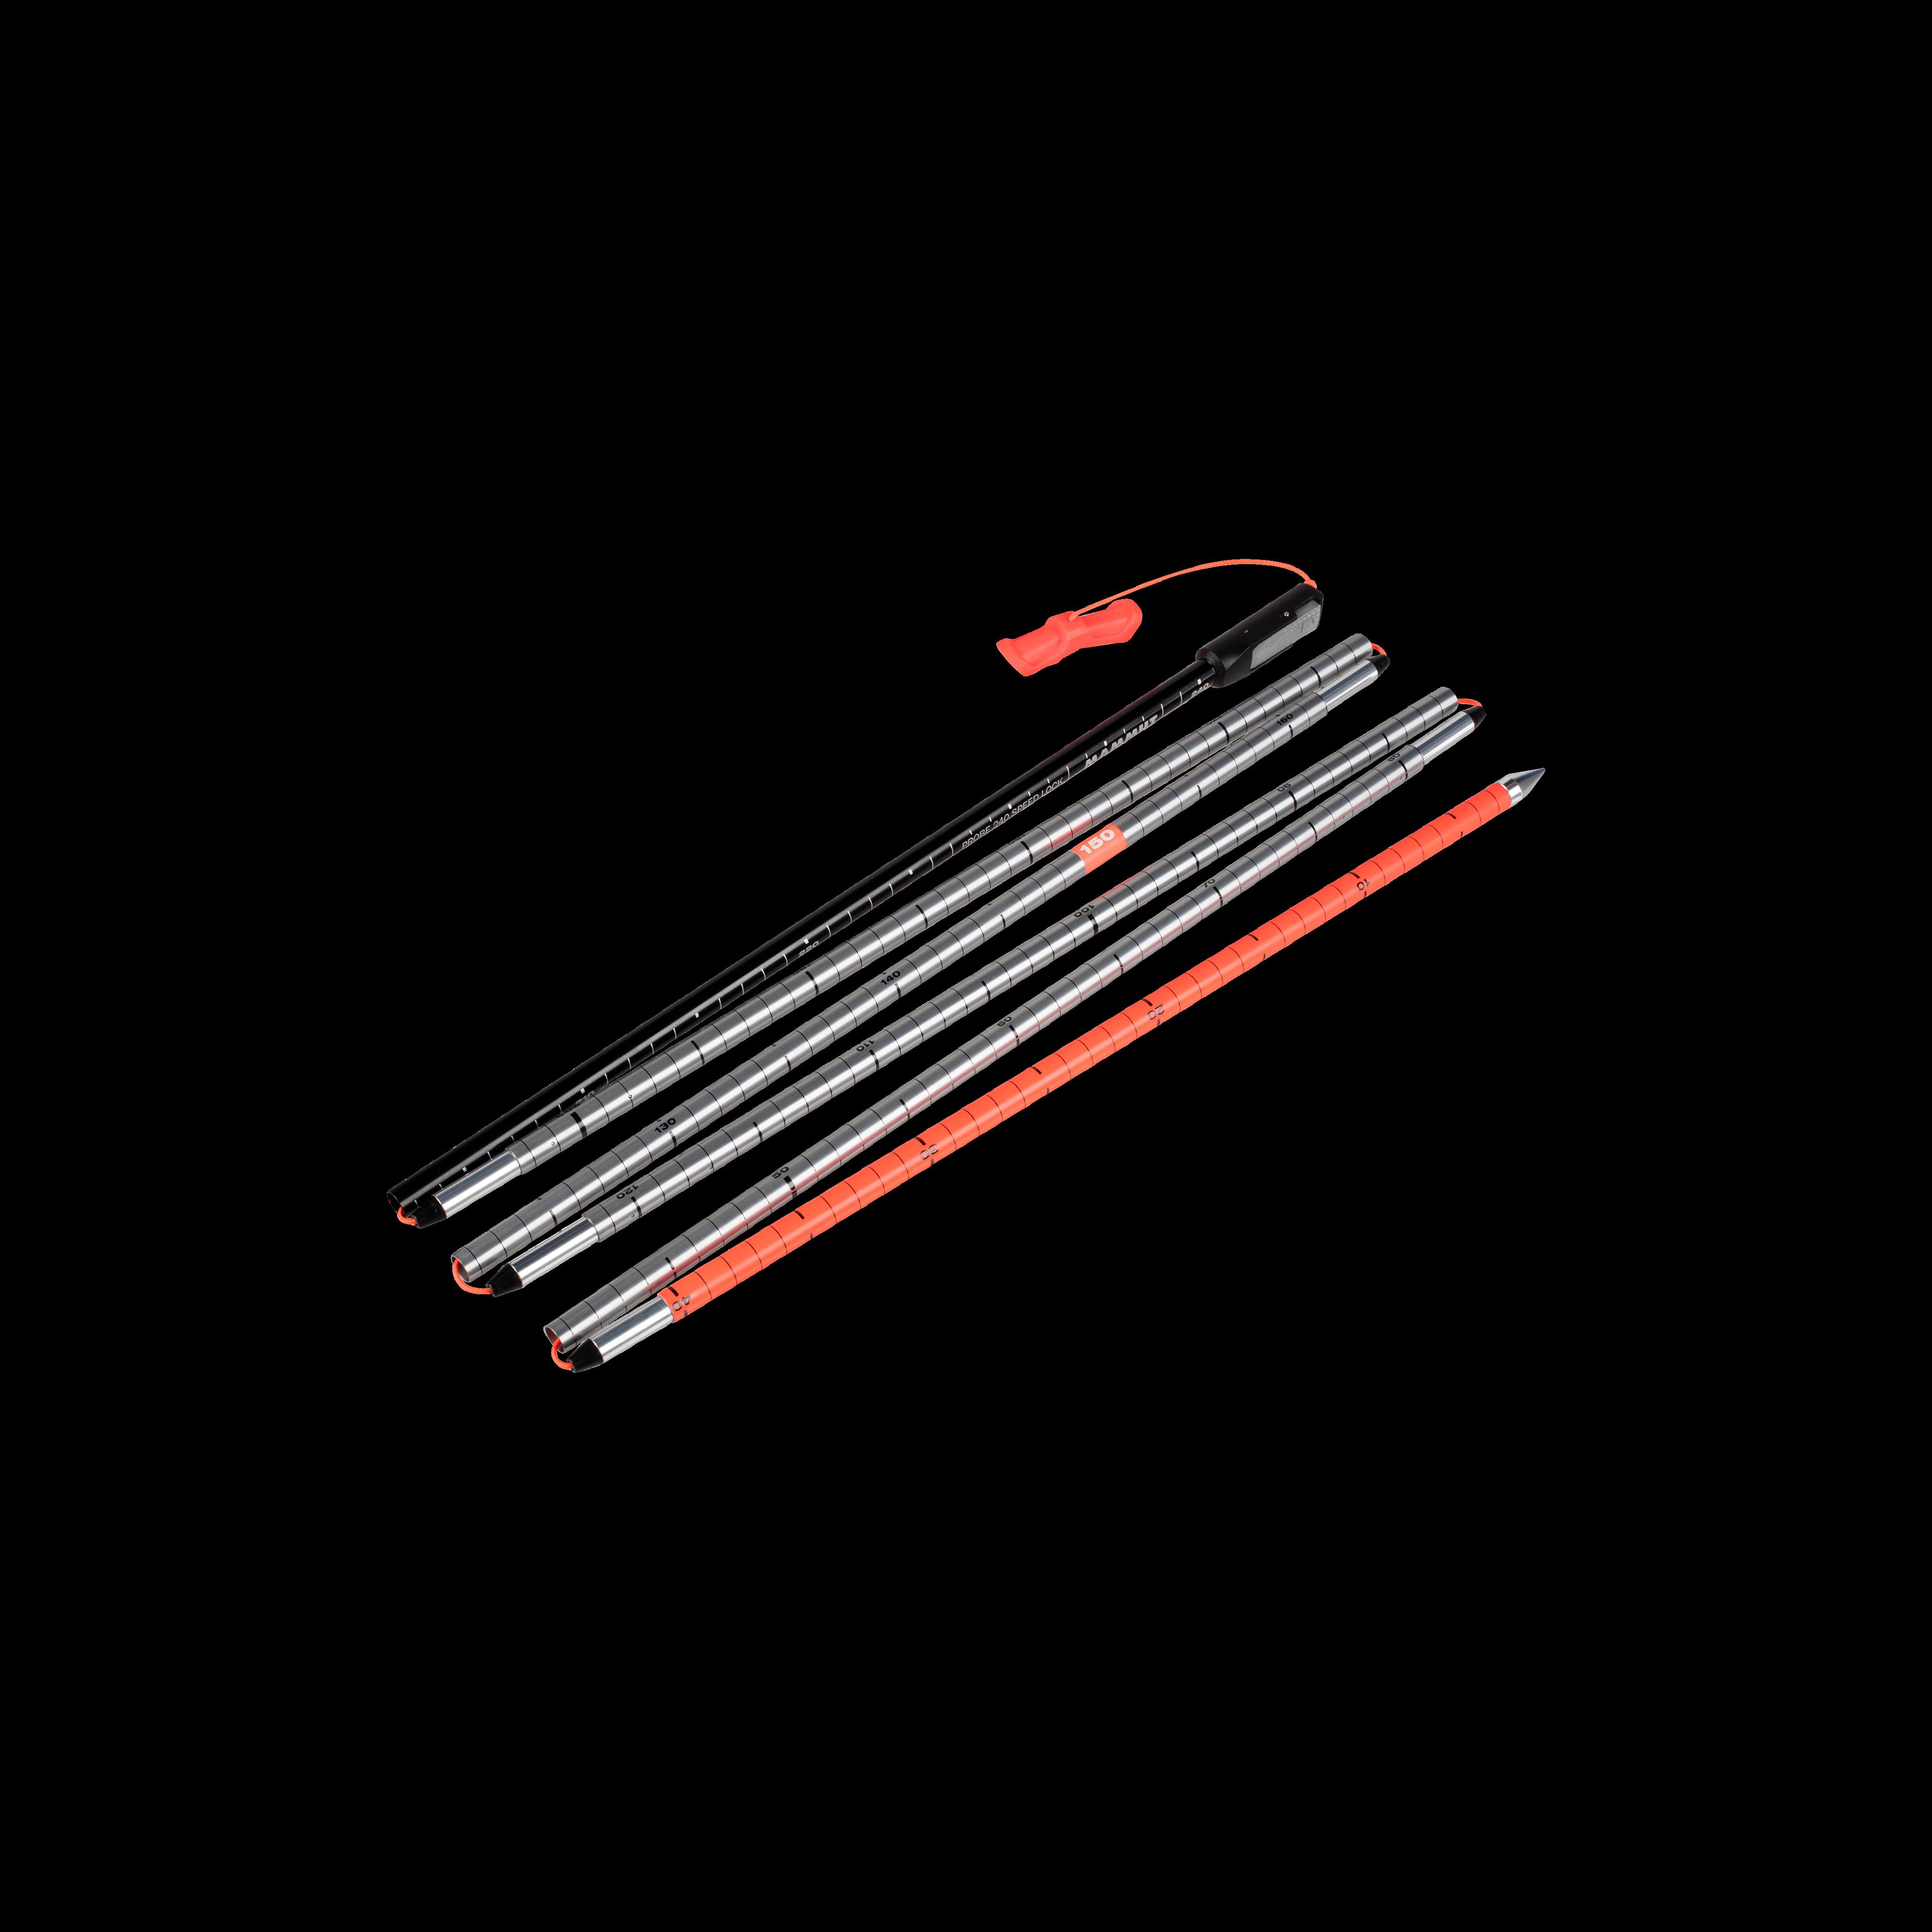 Probe 240 speed lock - neon orange, one size thumbnail